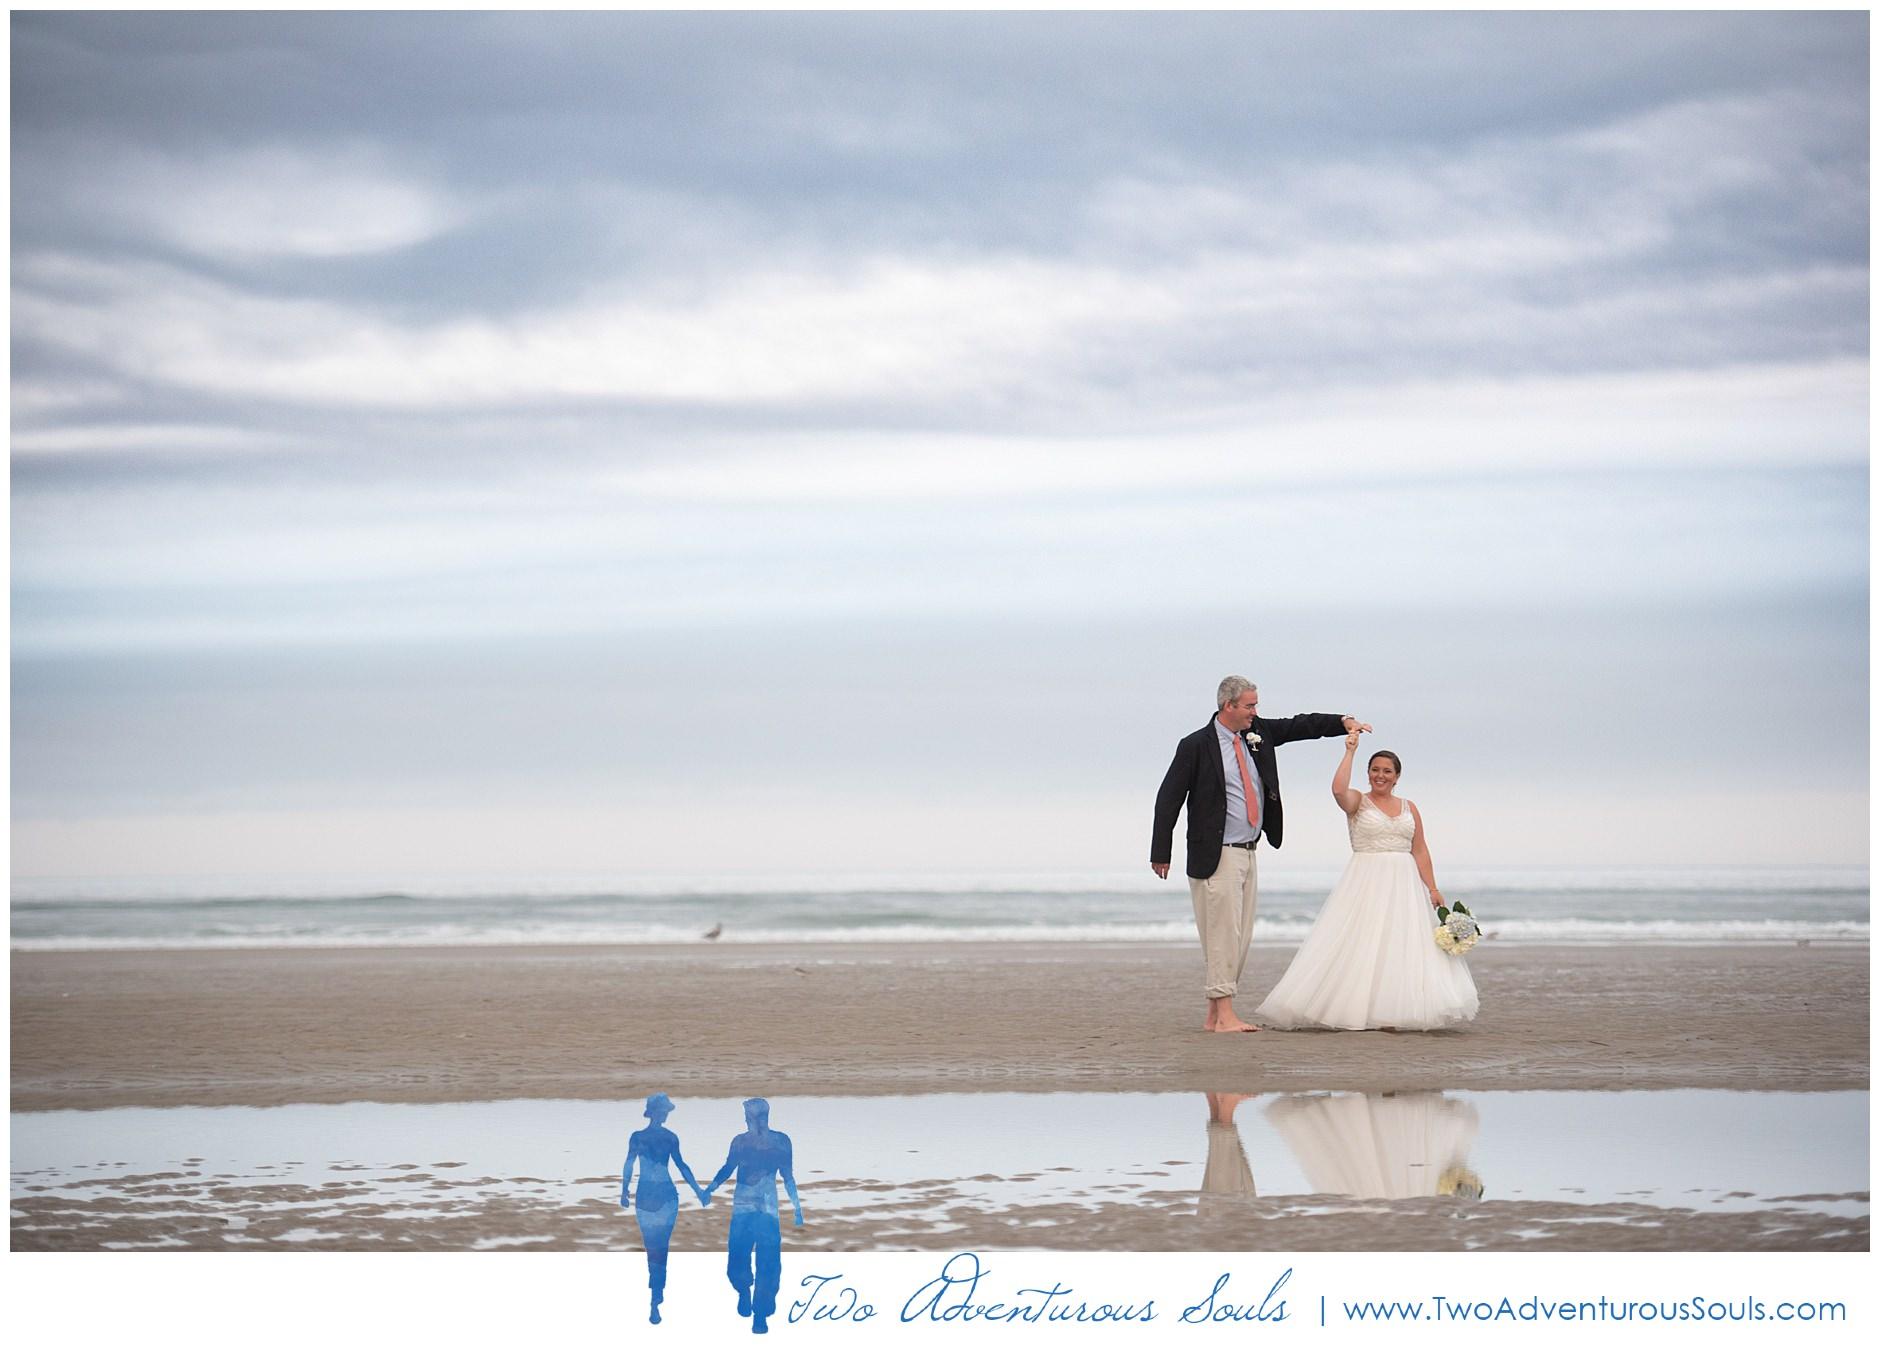 Maine Wedding Photographers, Ogunquit Wedding Photographers, Maine Elopement Photographers, Two Adventurous Souls-080619_0034.jpg